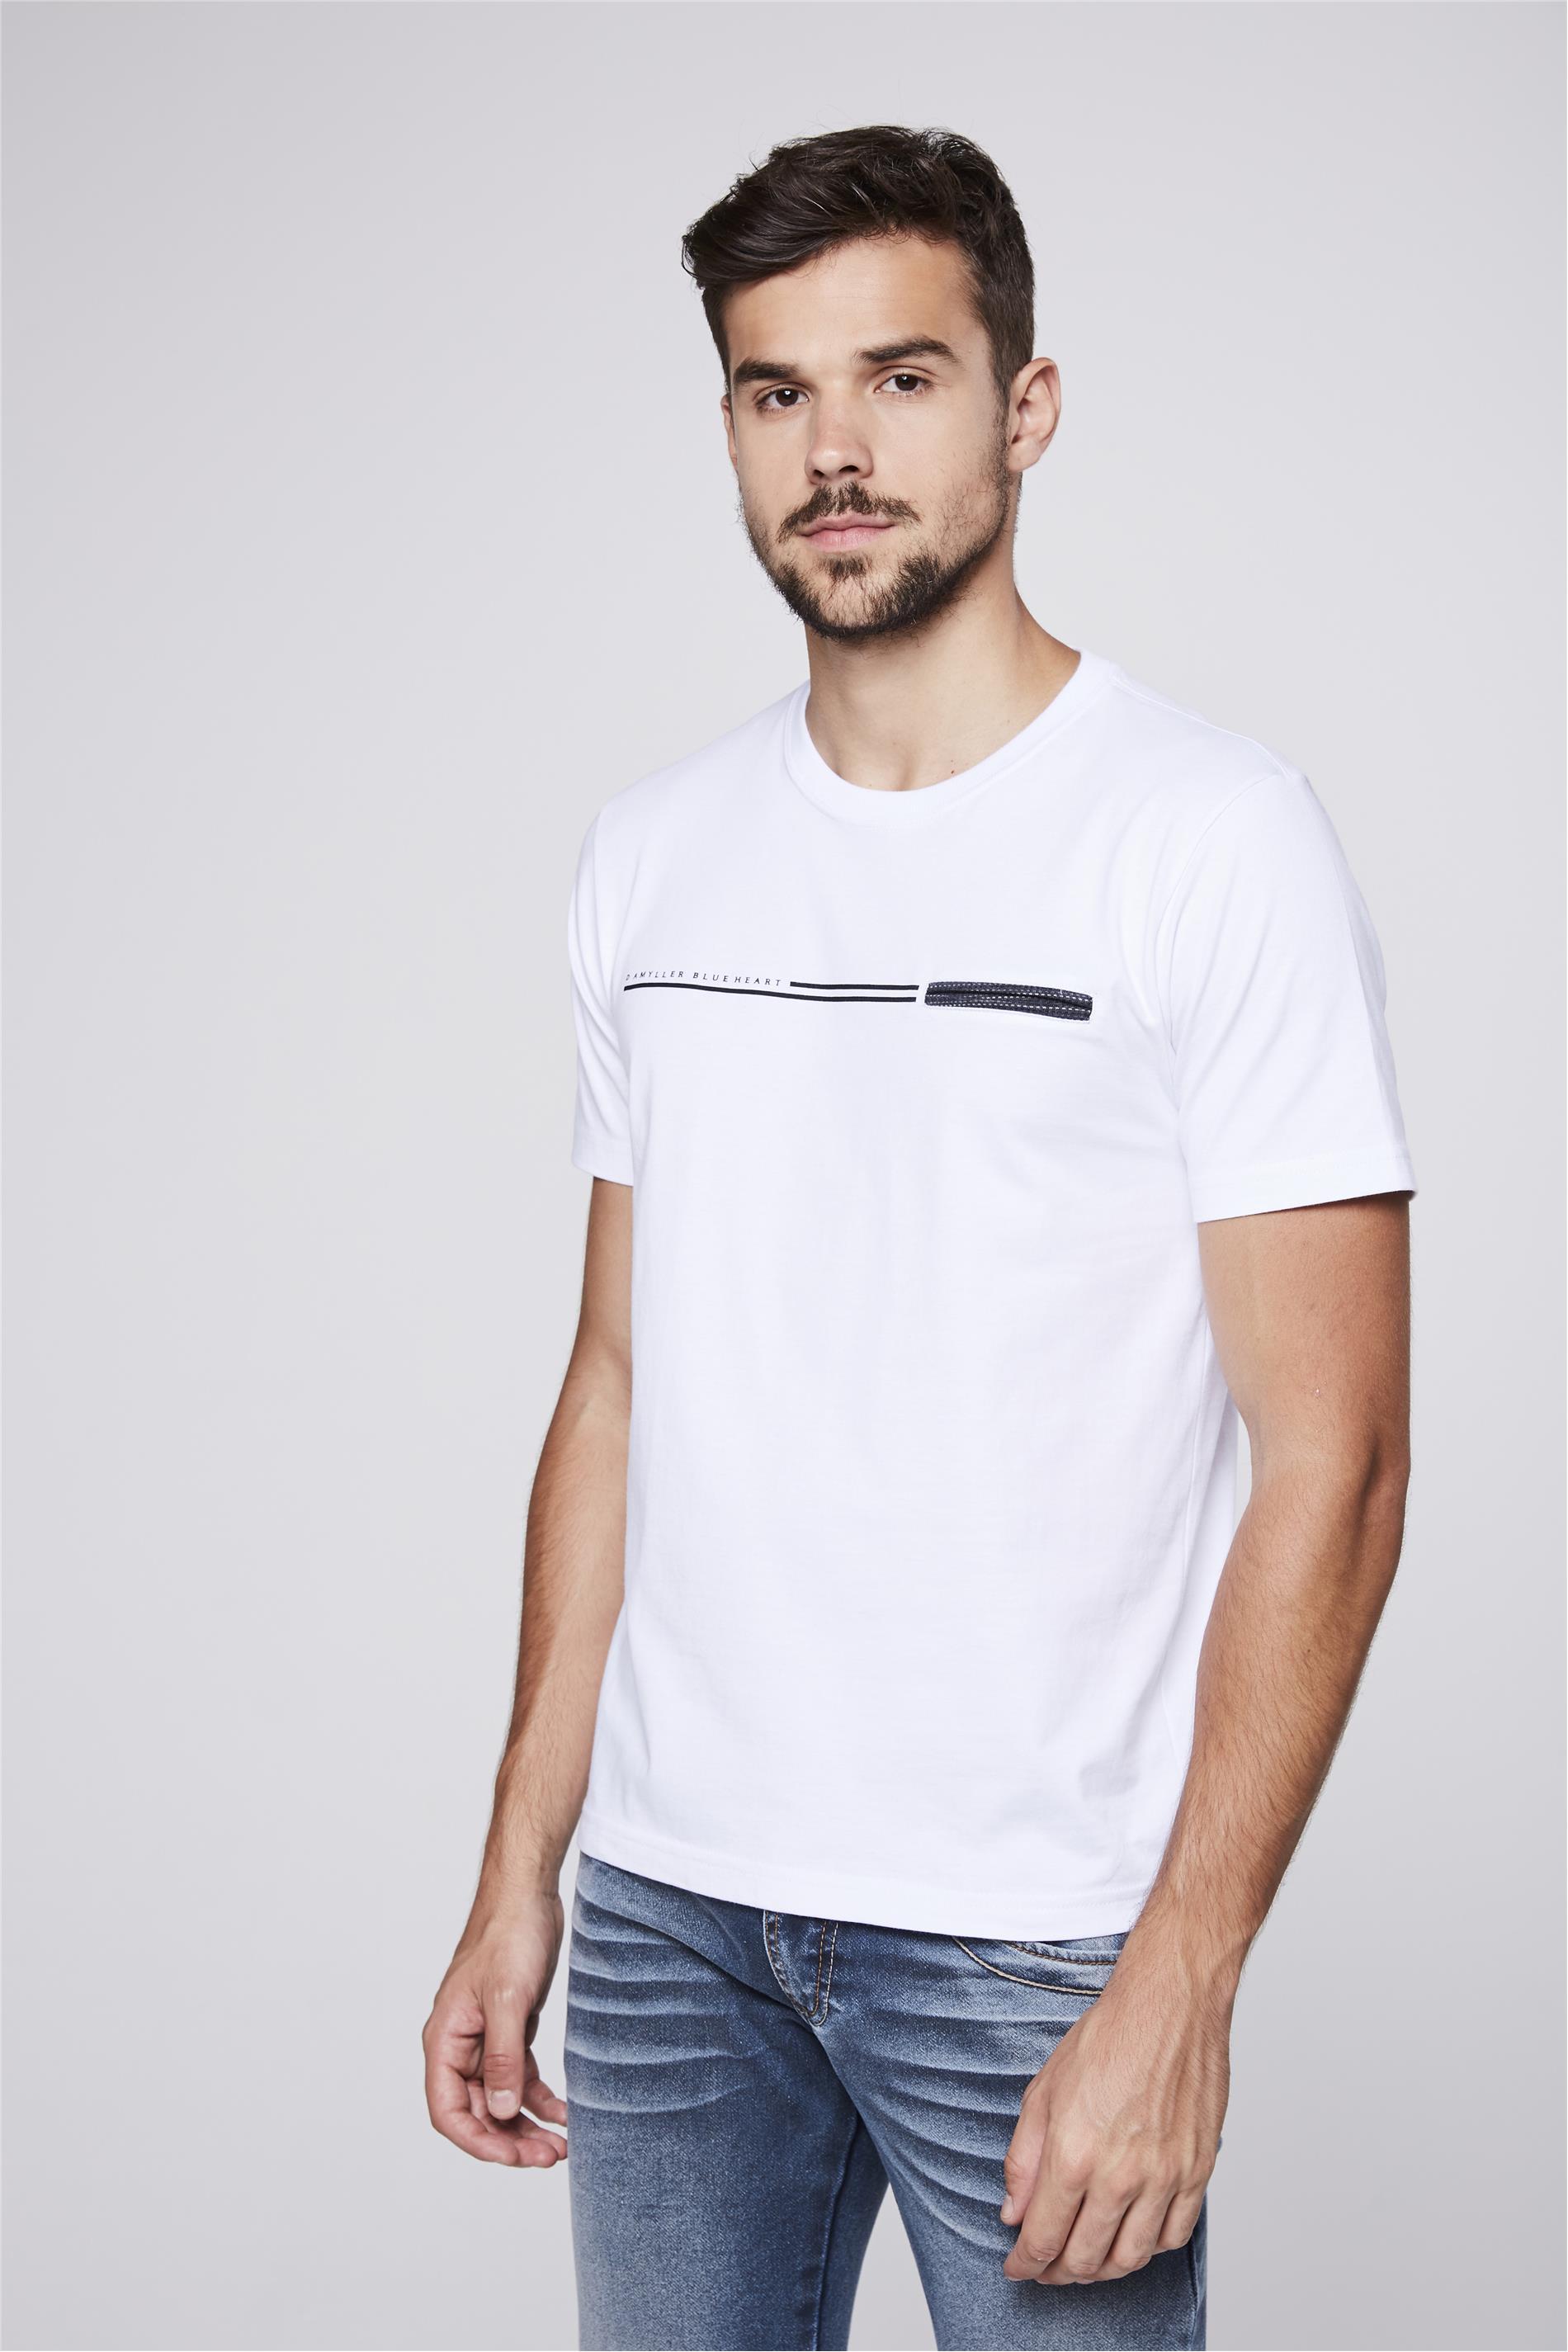 3c7bb92a01 Camiseta Básica com Bolso Masculina - Damyller